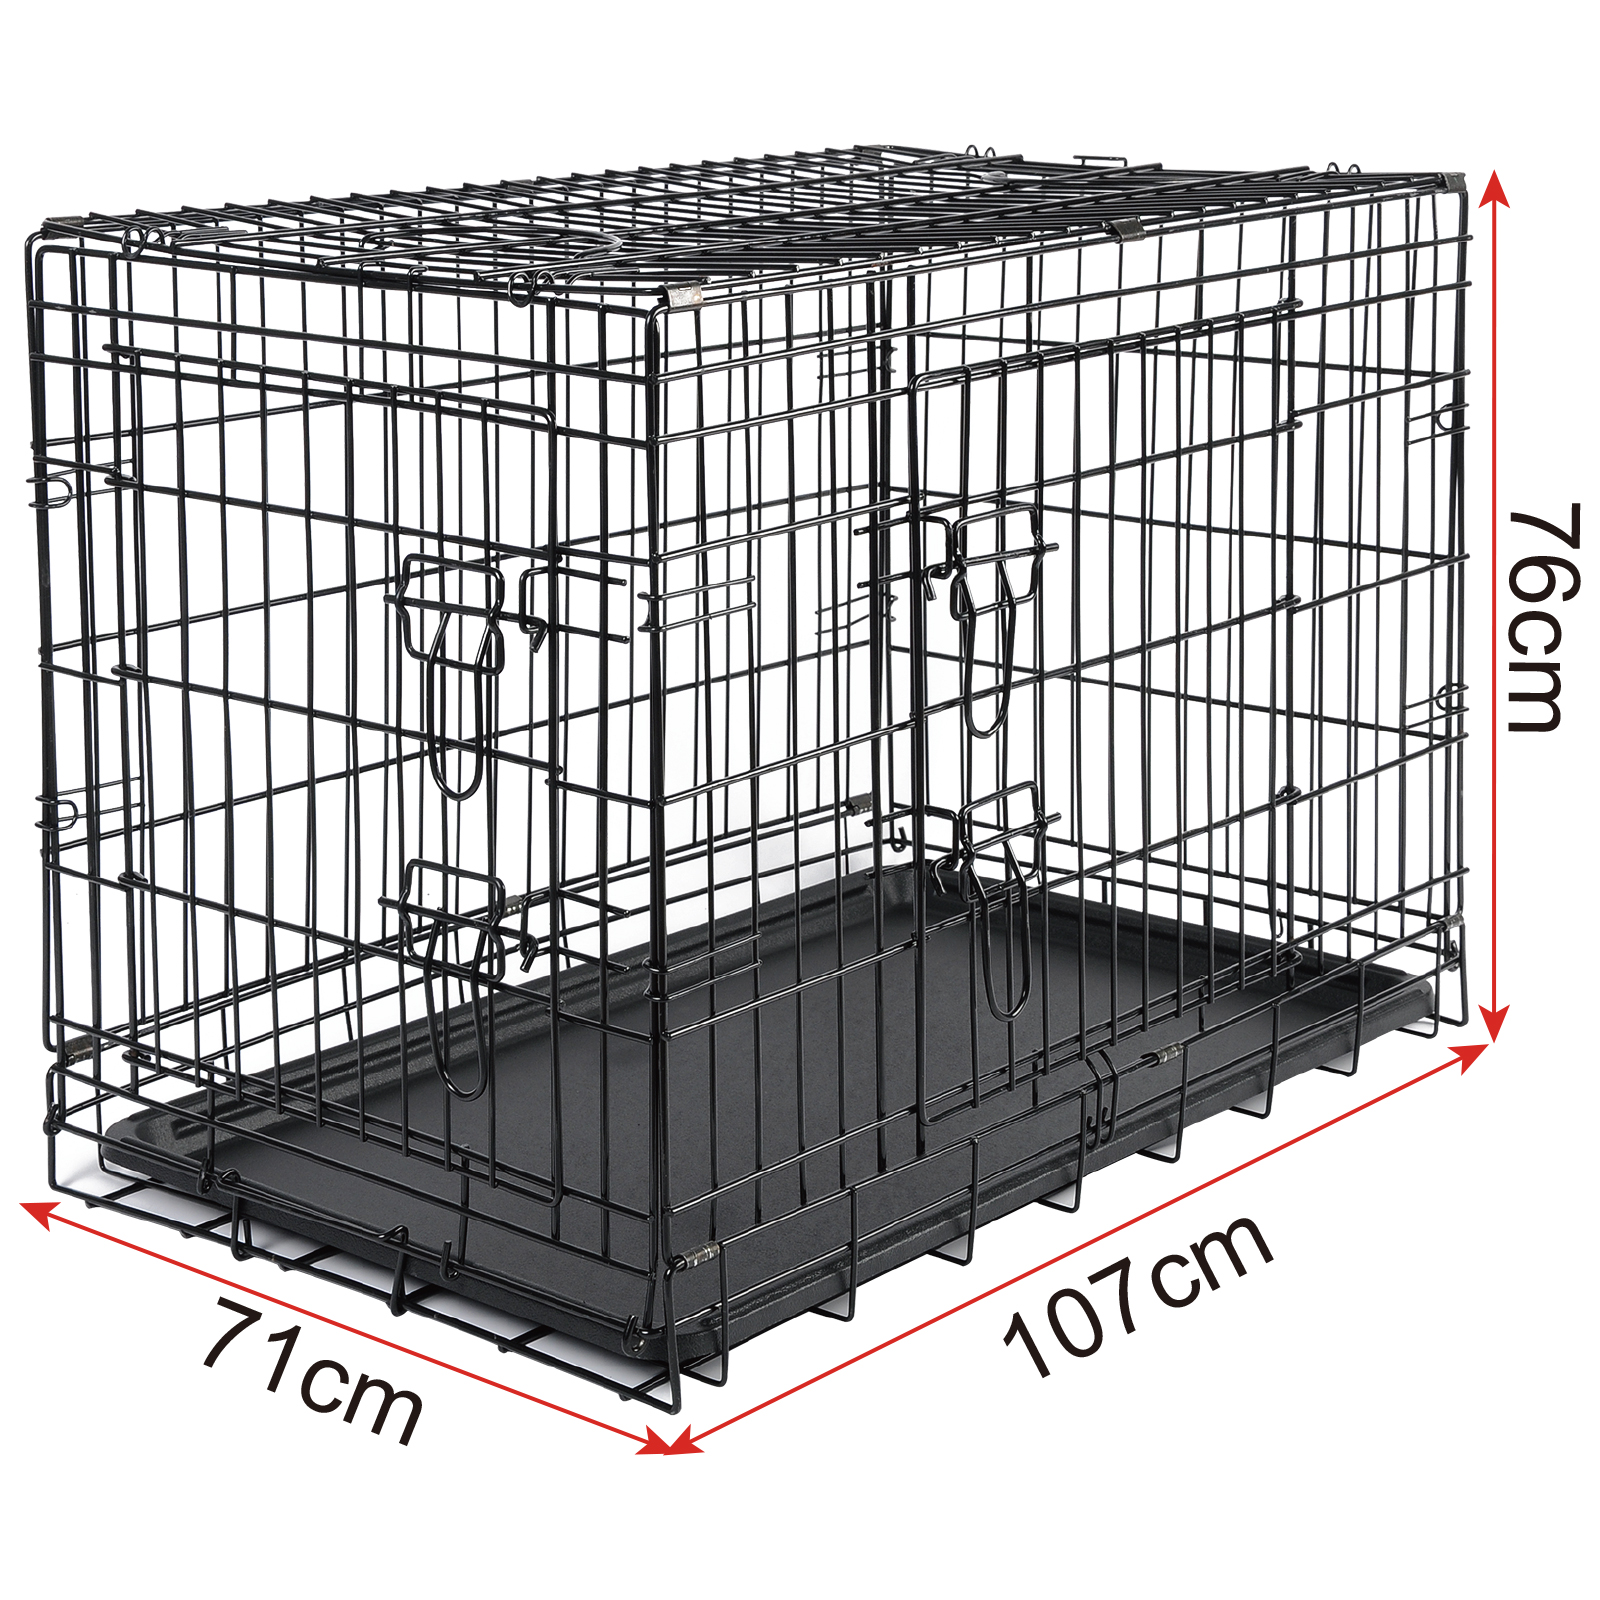 faltbare hundetransportbox hundebox metall reisebox transportbox xl ht2030m3 ebay. Black Bedroom Furniture Sets. Home Design Ideas